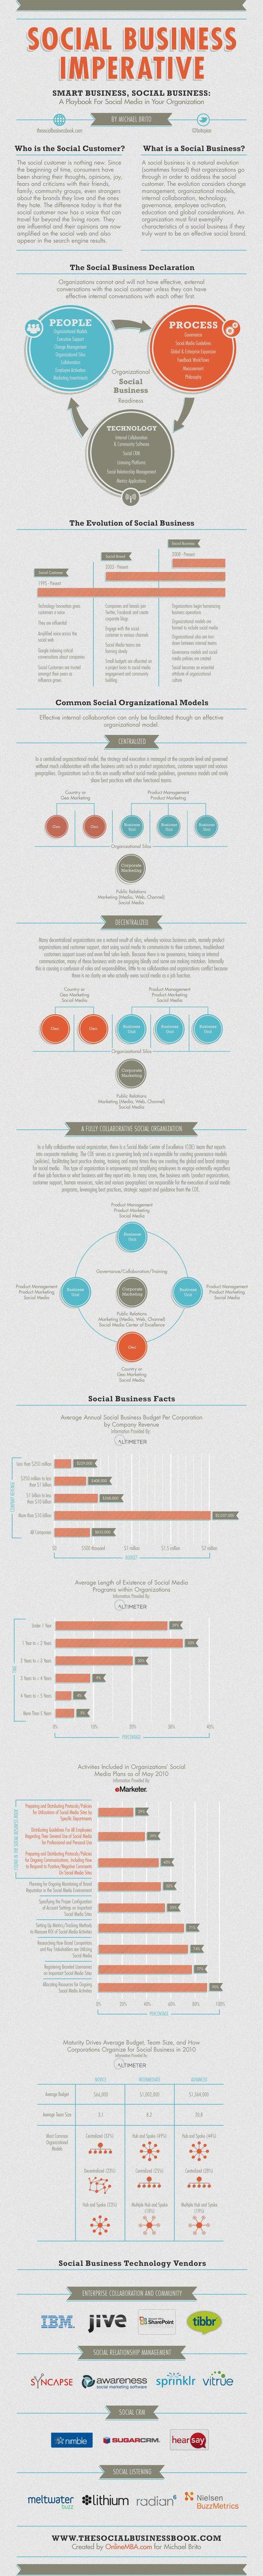 5 Essential Social Business #Infographics | WEBOLUTION! | Scoop.it